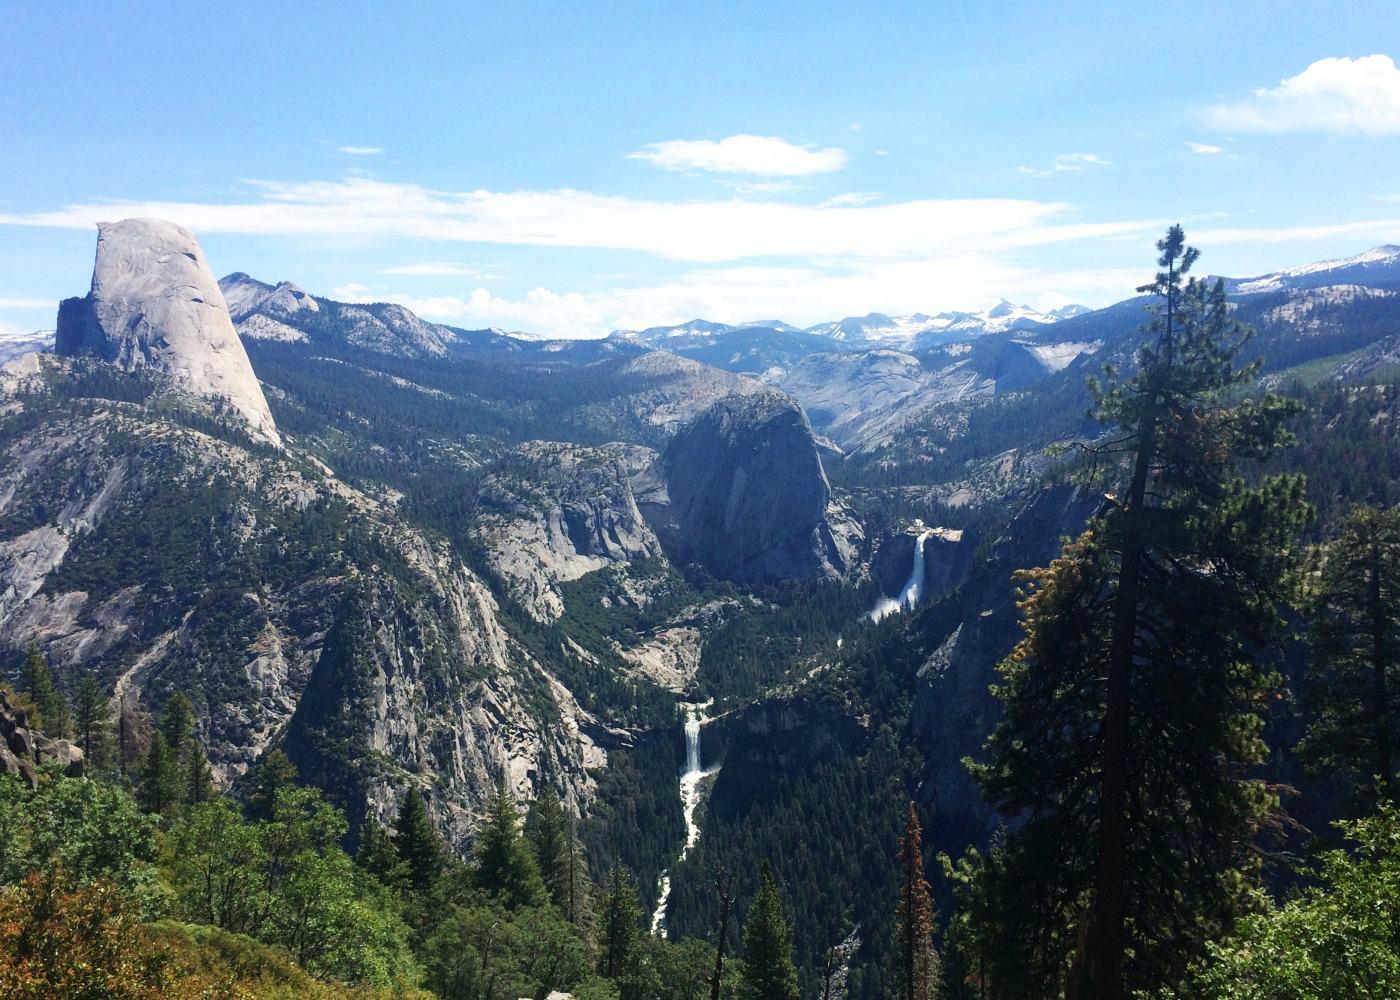 Pacific Rim Equipment >> Southern Yosemite Backpack Sampler California | Sierra Club